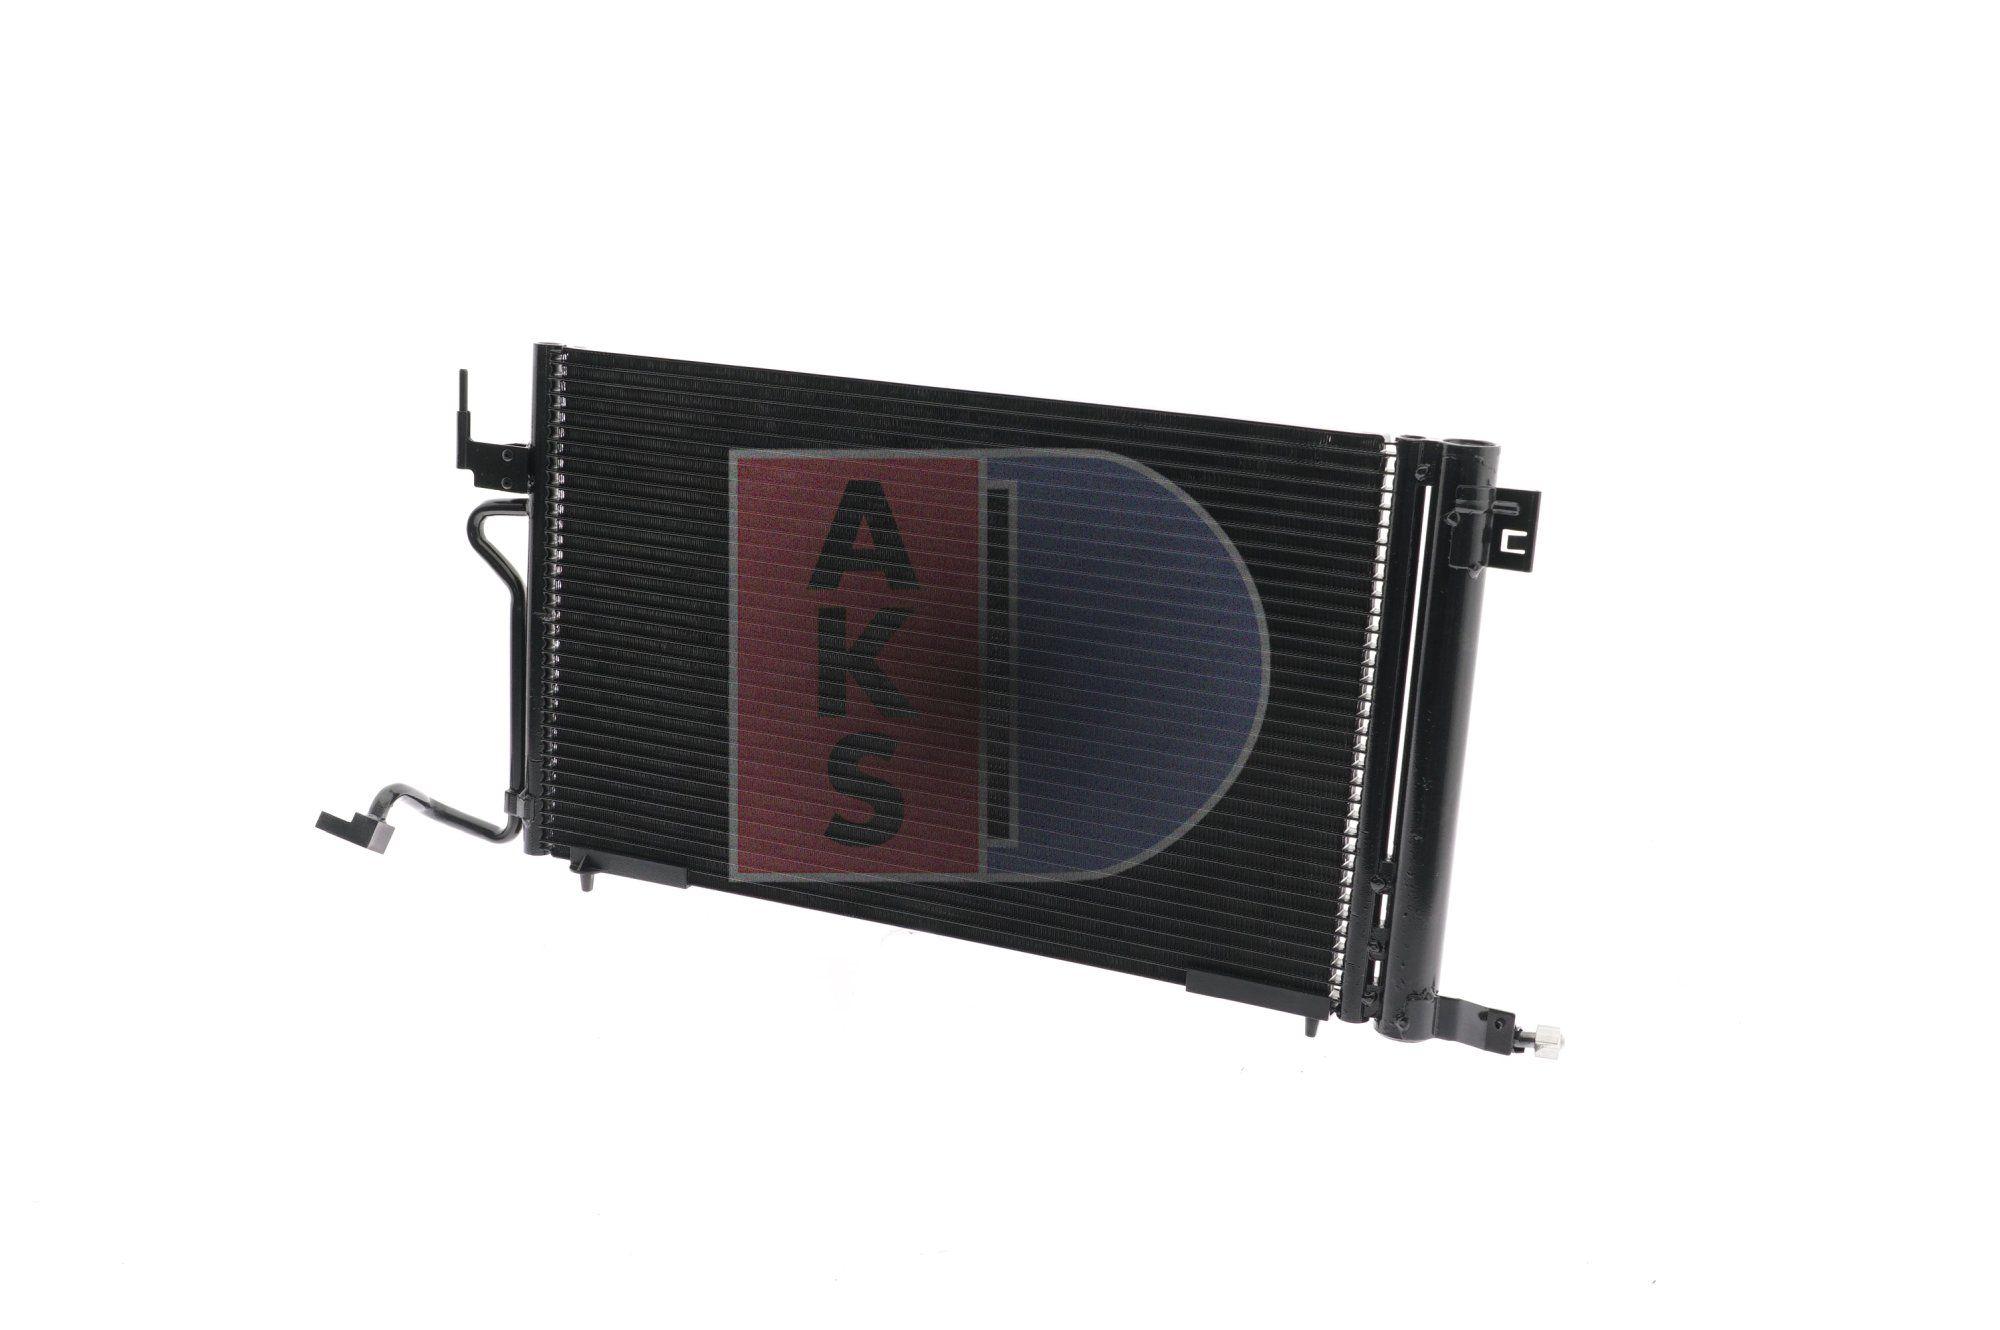 Klimakondensator 162100N AKS DASIS 162100N in Original Qualität